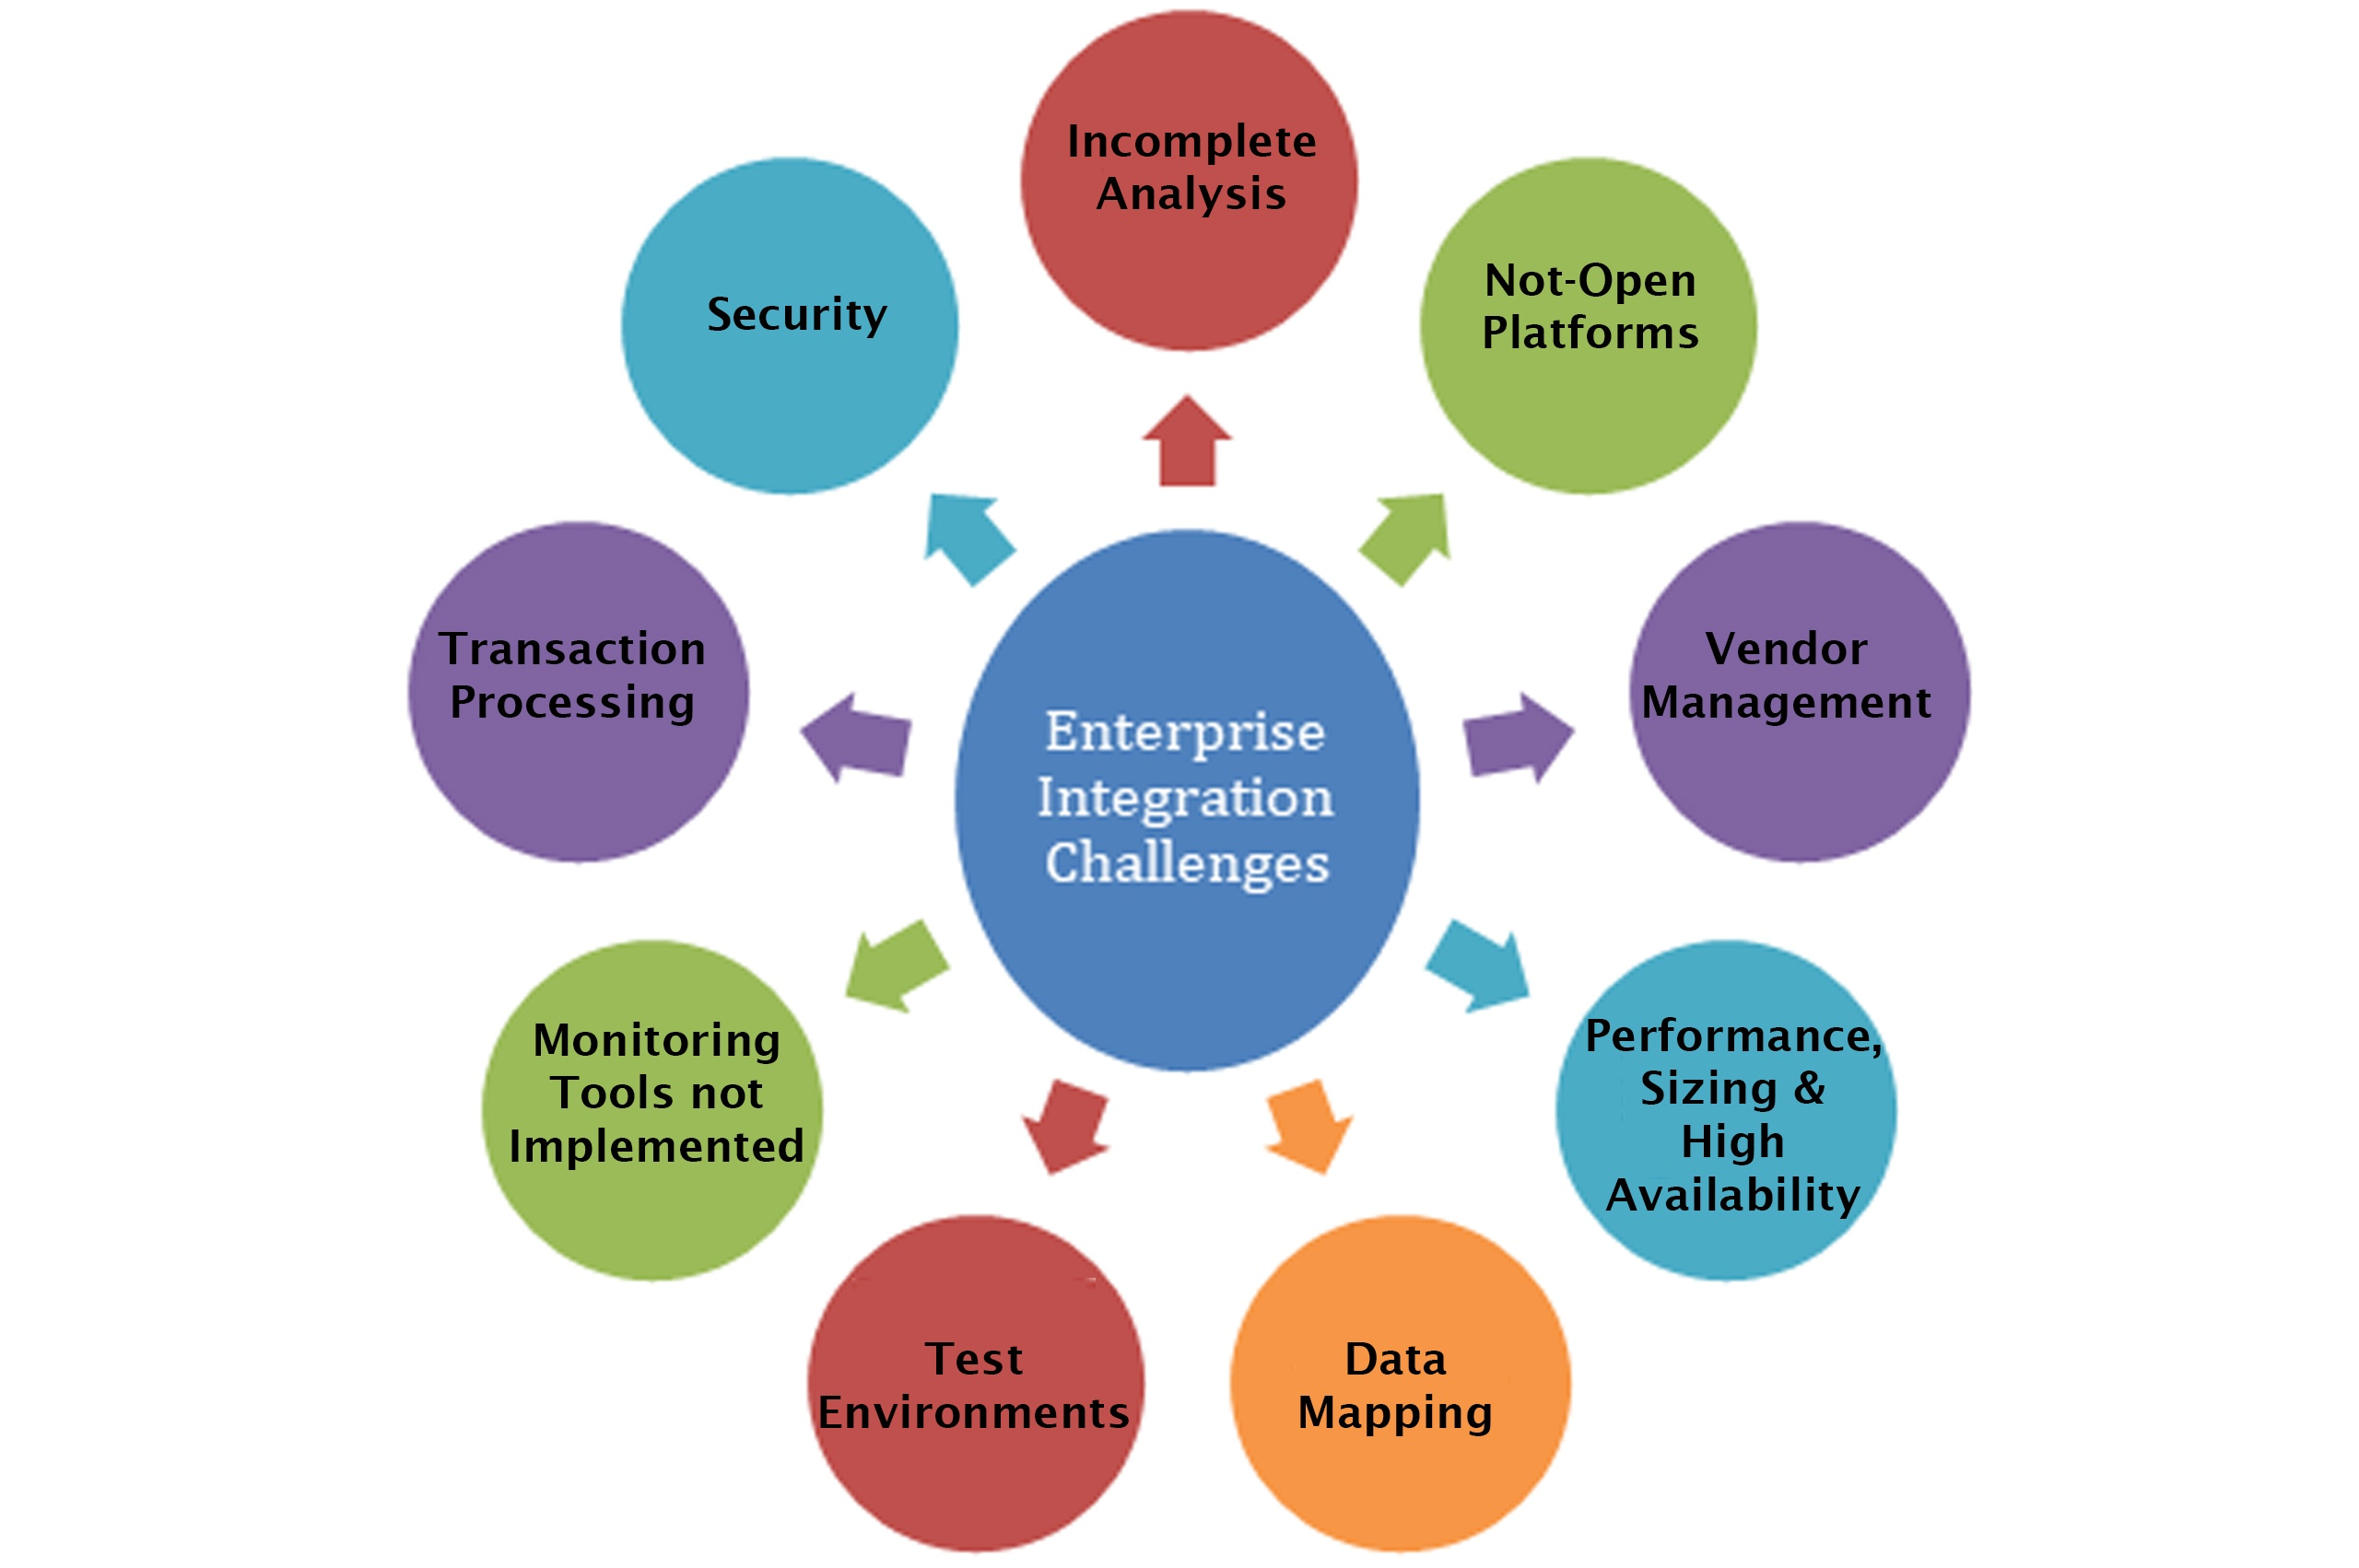 Enterprise Integration Challenges